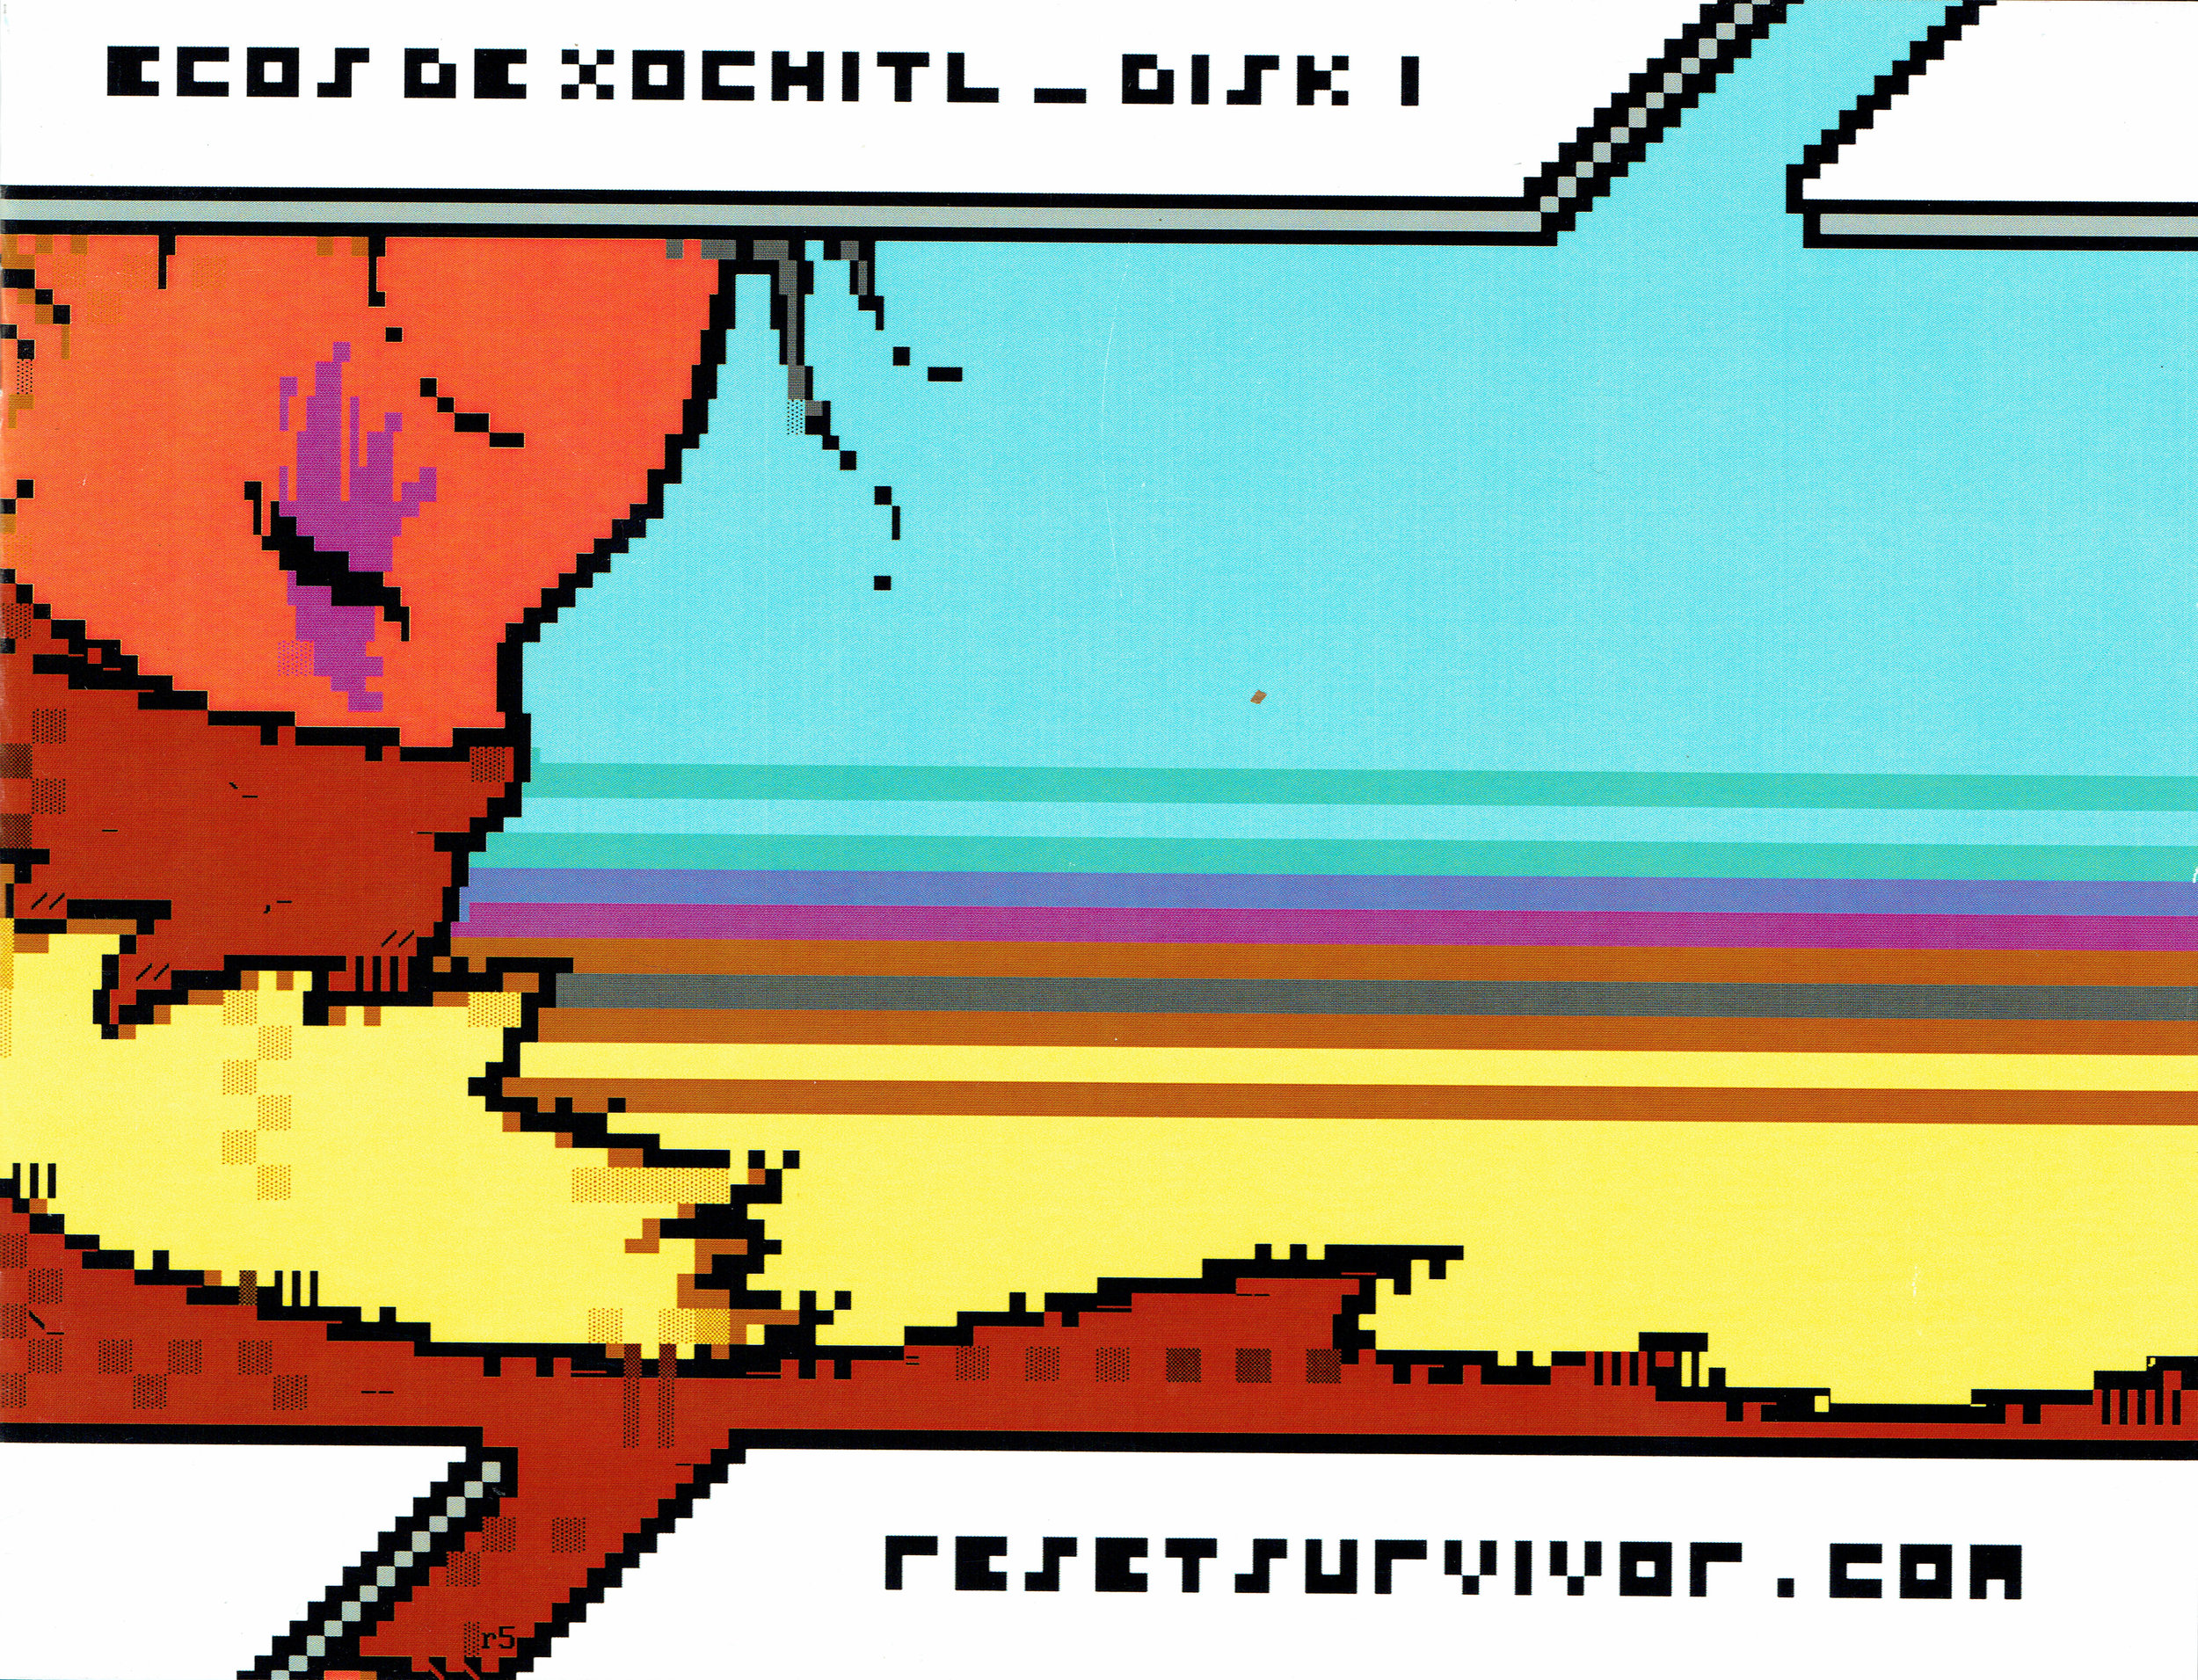 Ecos De Xochitl Disk 1 from Reset Survivor.